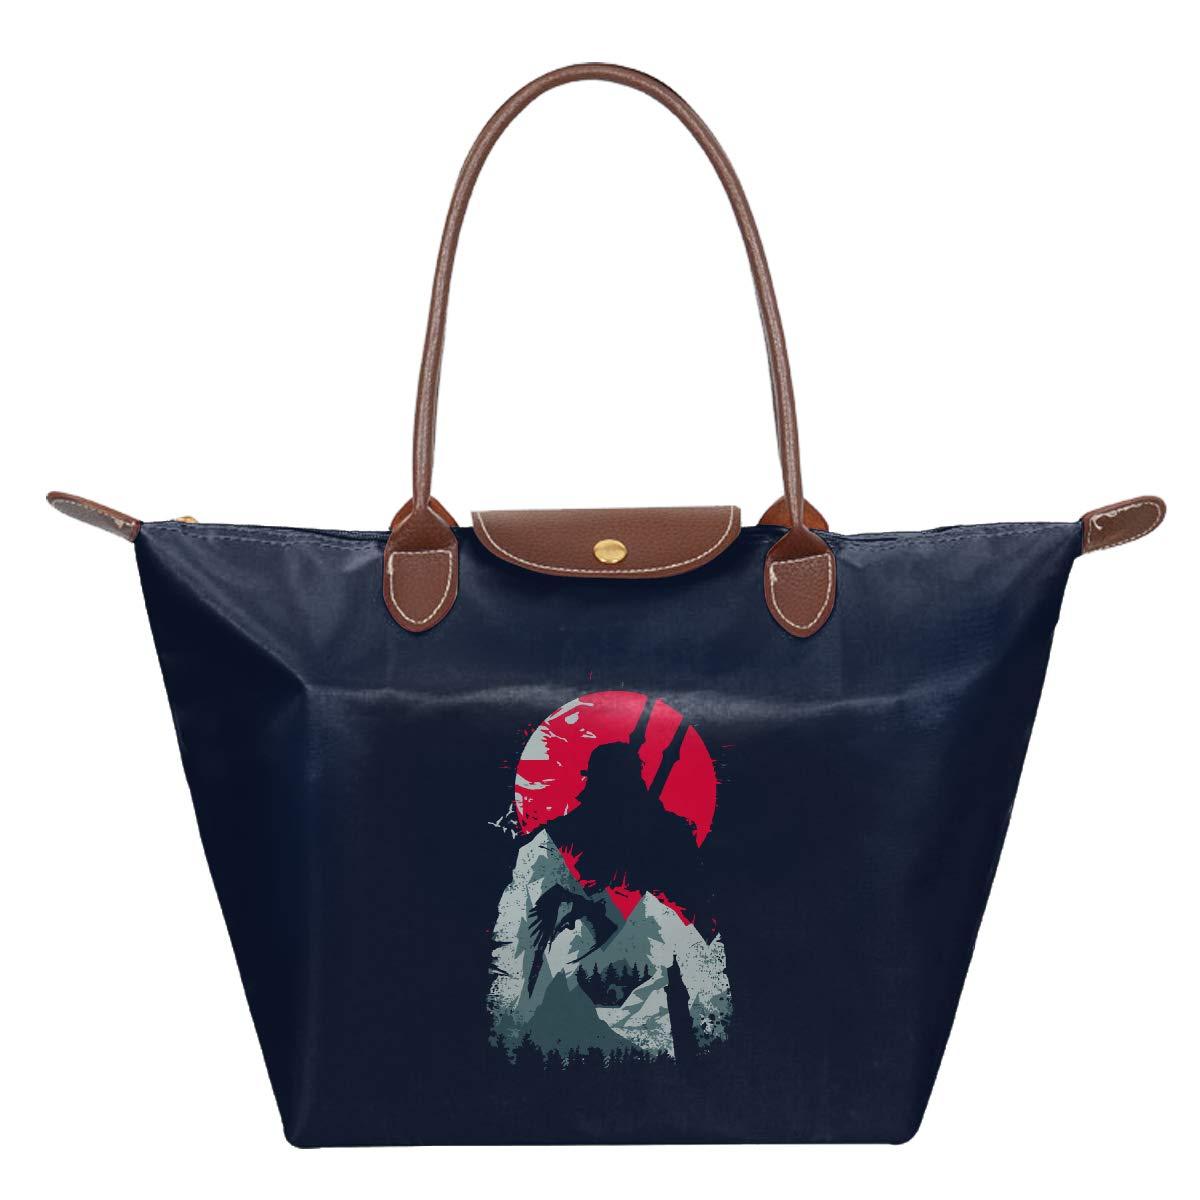 Witcher Wild Wonder Sun Mountain Silhouette Waterproof Leather Folded Messenger Nylon Bag Travel Tote Hopping Folding School Handbags